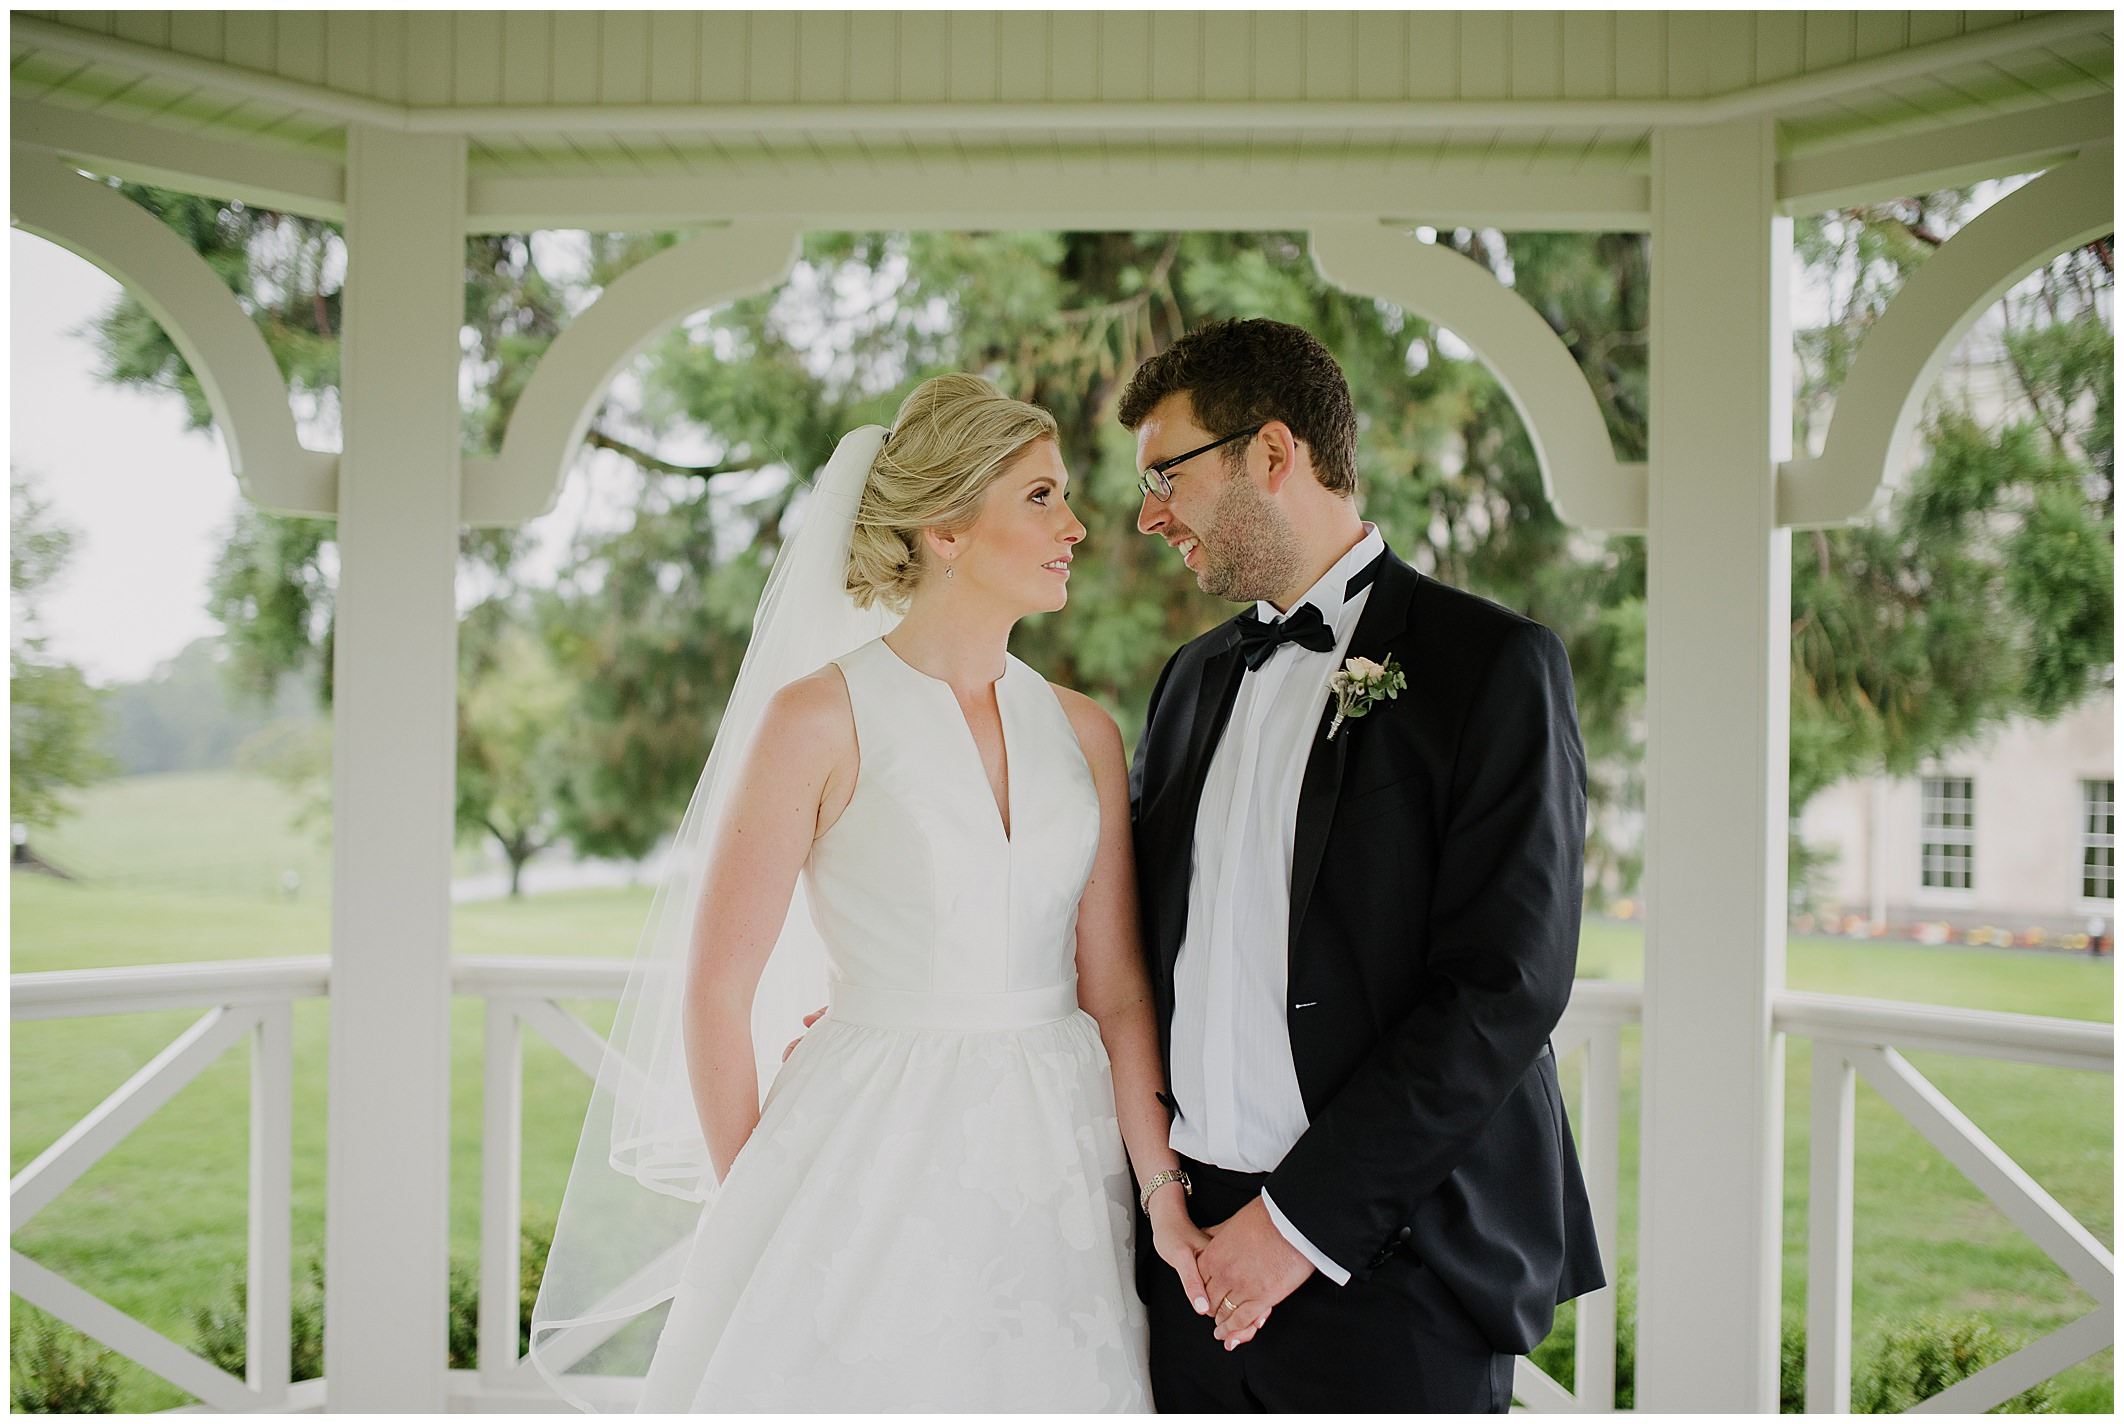 farnham-estate-wedding-jude-browne-photography_0129.jpg